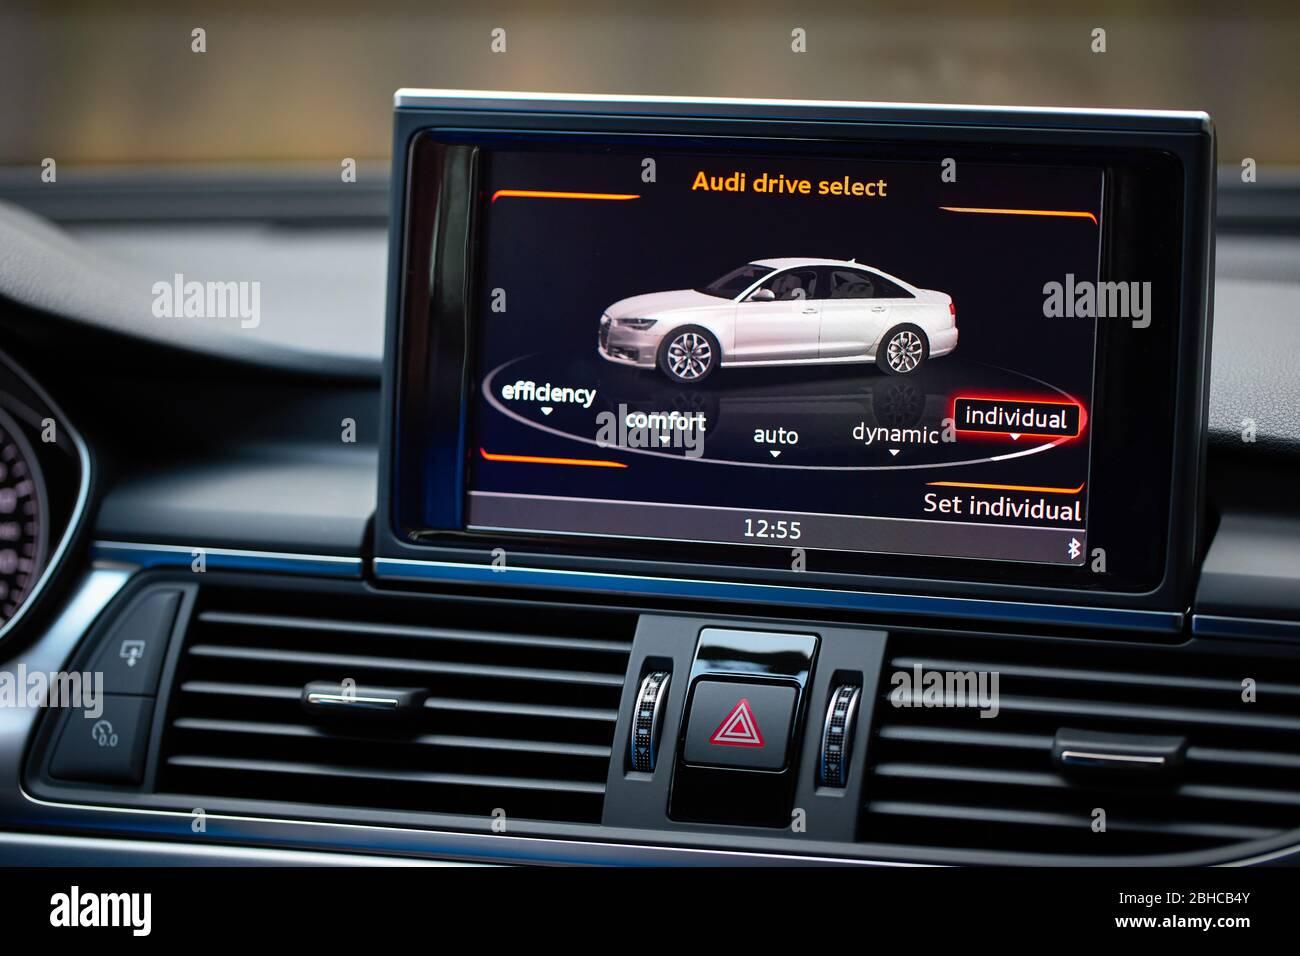 Kelebihan Audi 4G Review